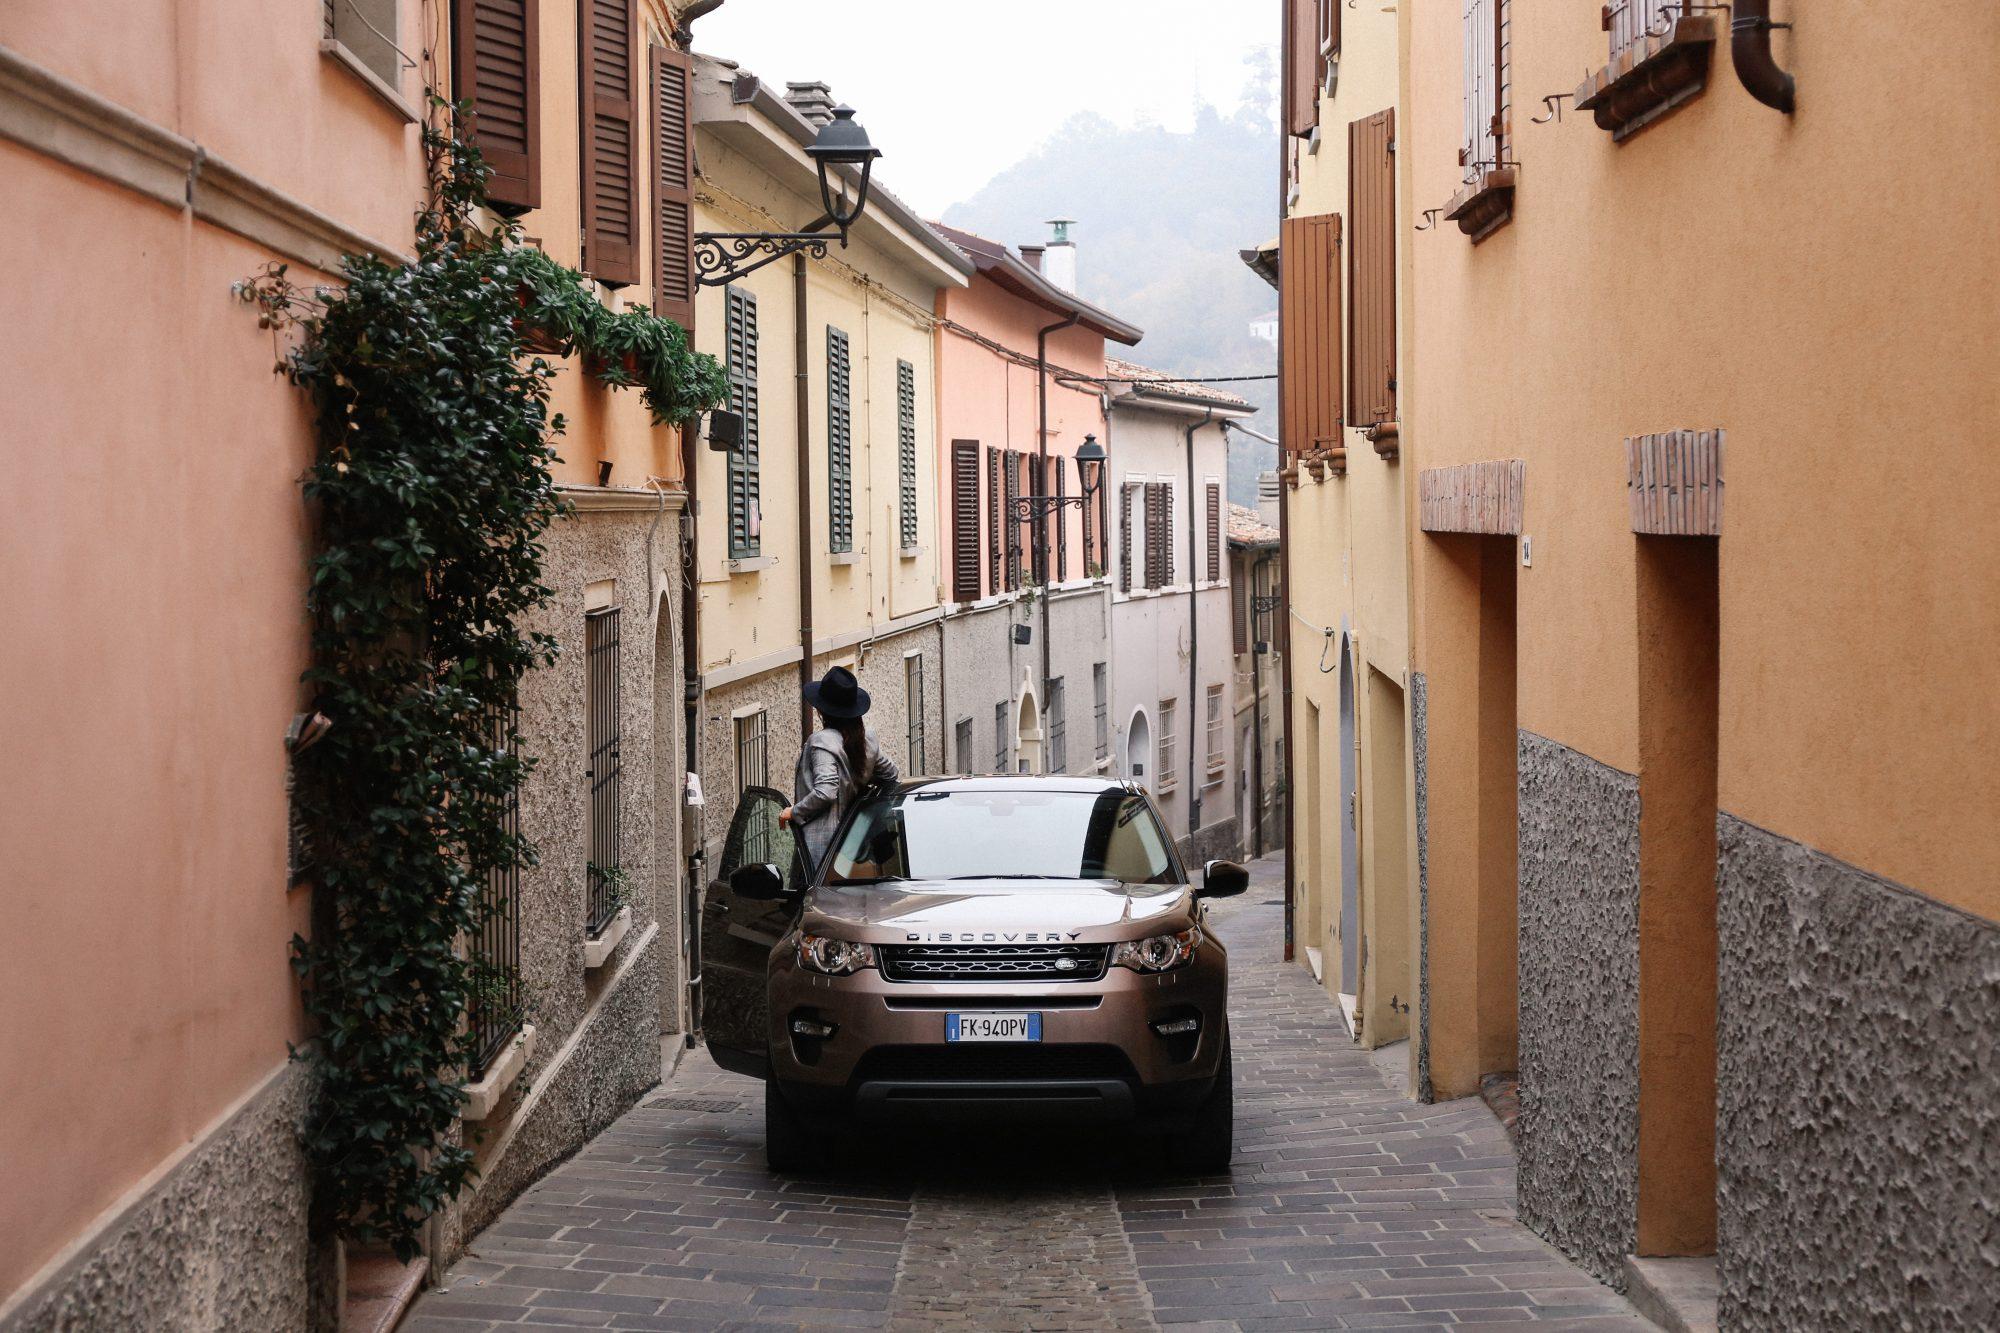 LandOutriders - Un weekend in Romagna con Pier Giulio Caivano | Collater.al 5